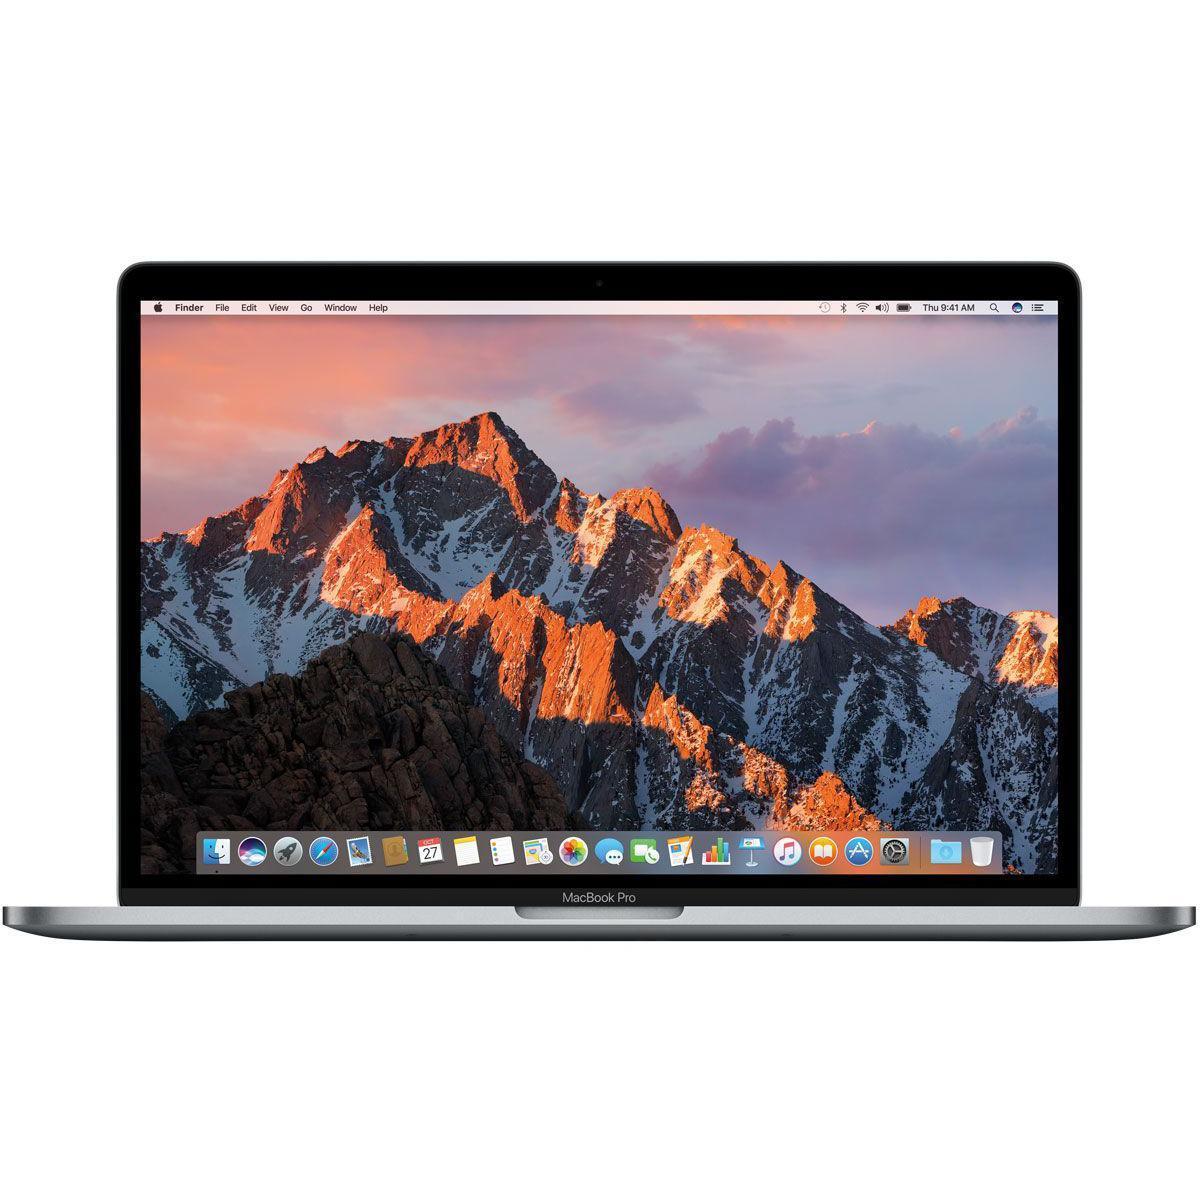 MacBook Pro Retina 15,4-tum (2016) - Core i7 - 16GB - SSD 1 TB AZERTY - Fransk